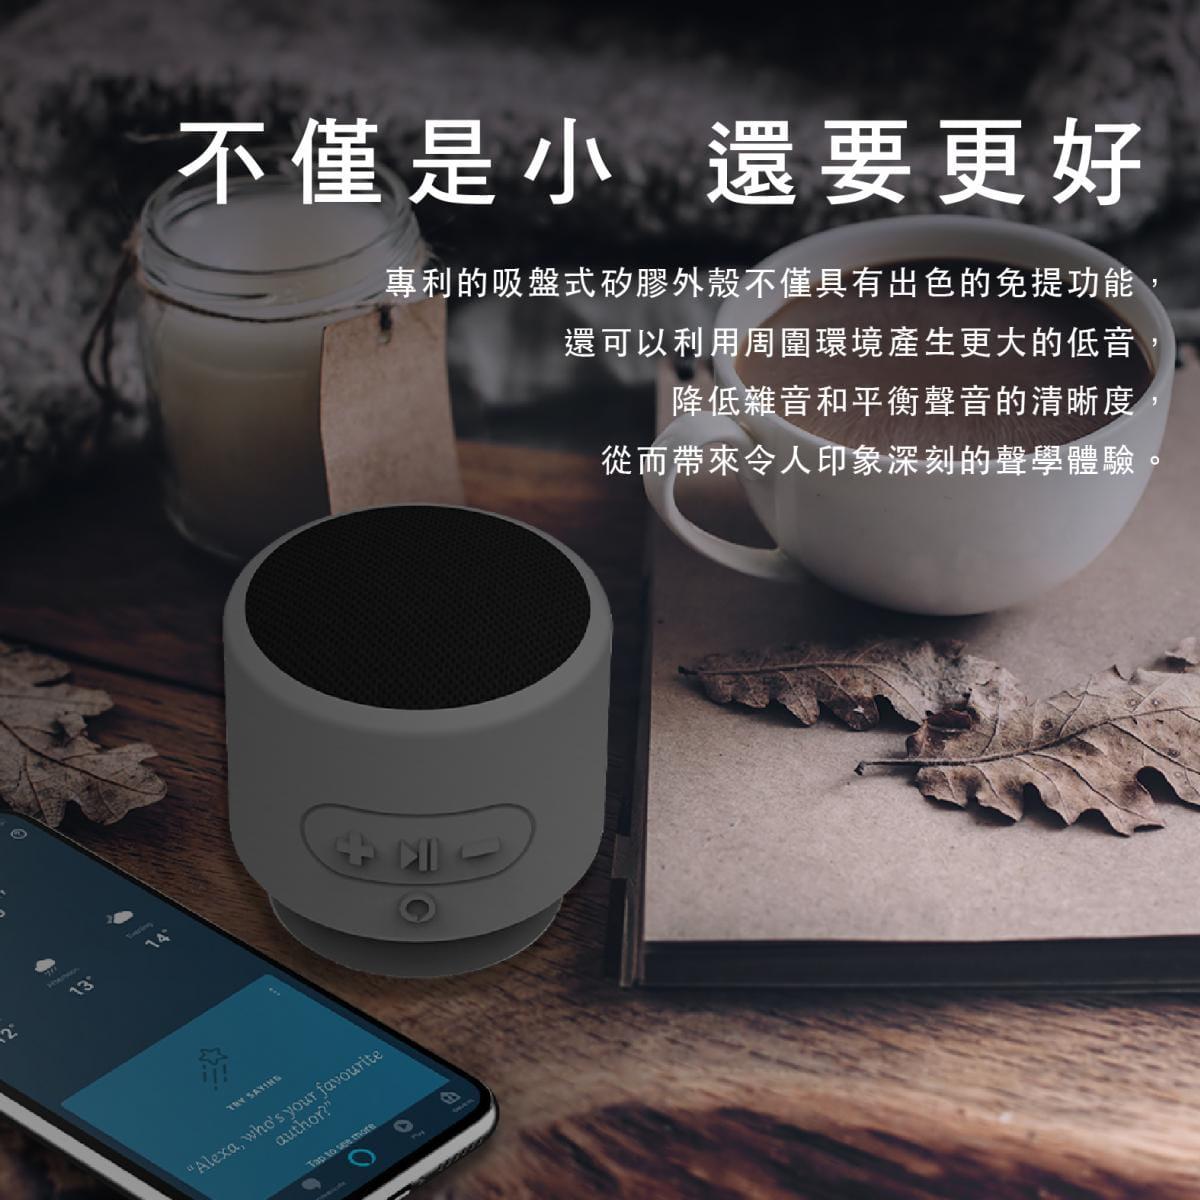 Addon Apollo Voice攜帶式Siri/Google藍芽智能音箱 4